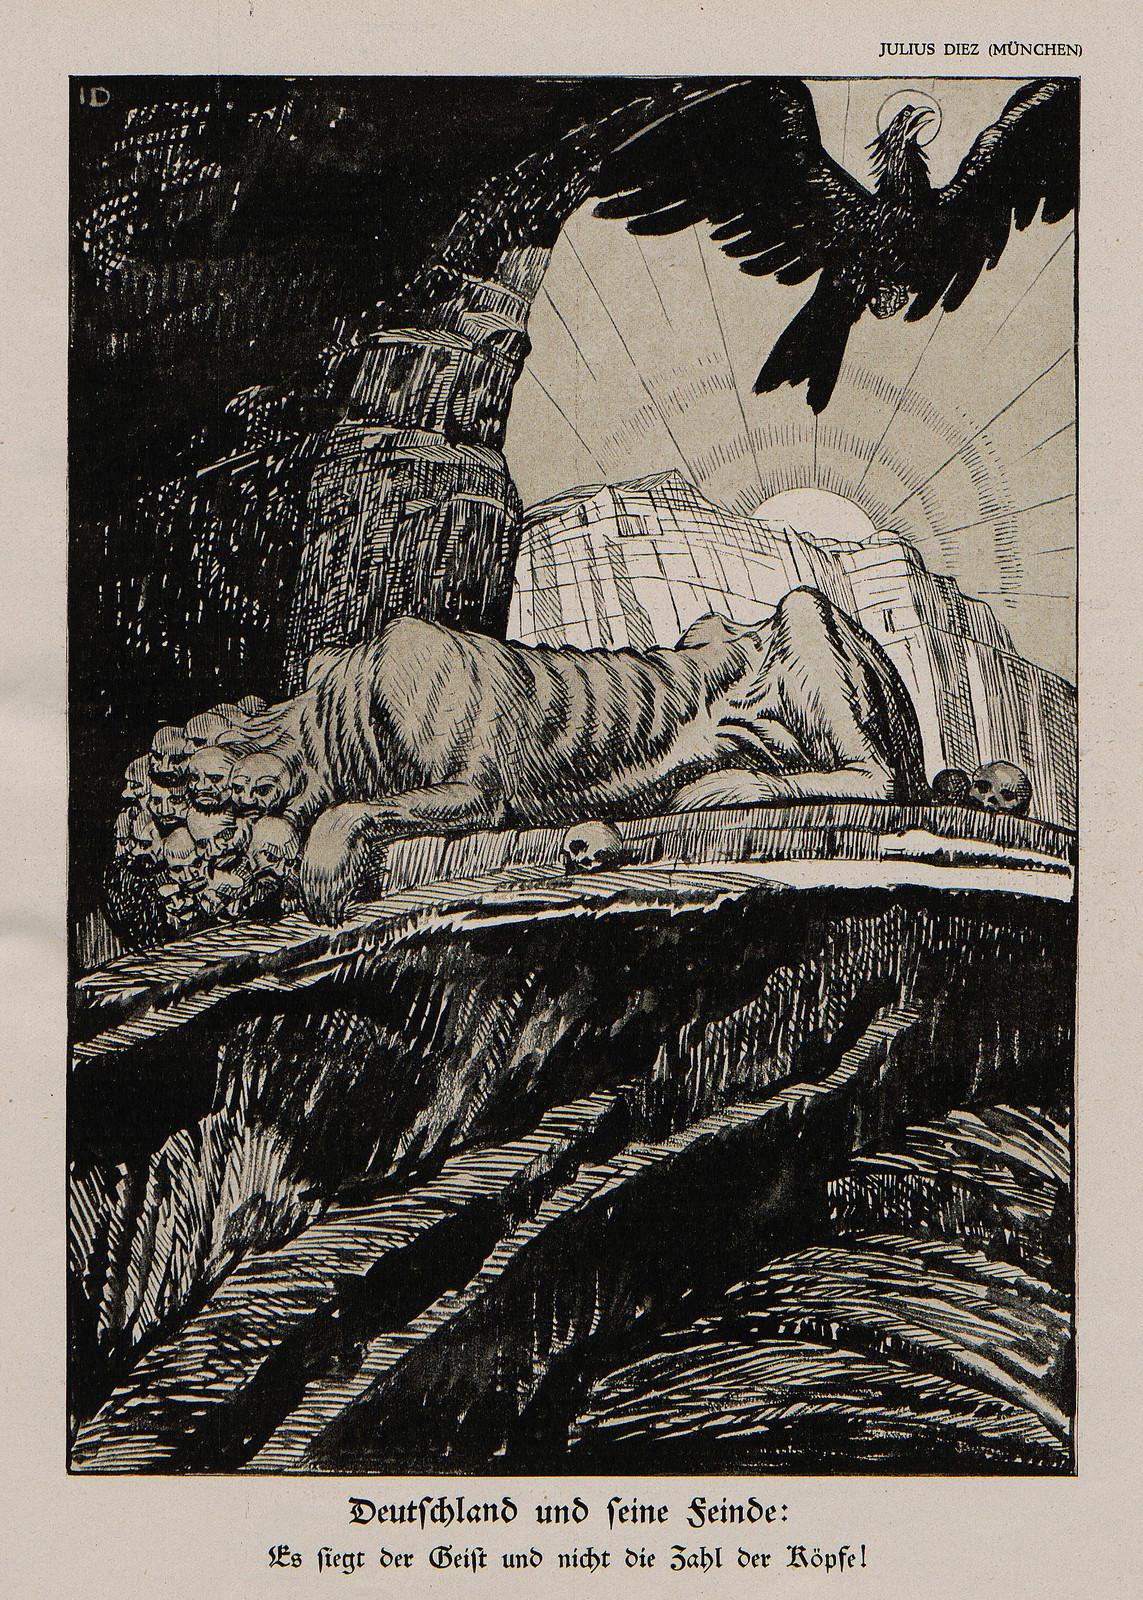 Julius Diez - Germany and It's Fiend, 1914